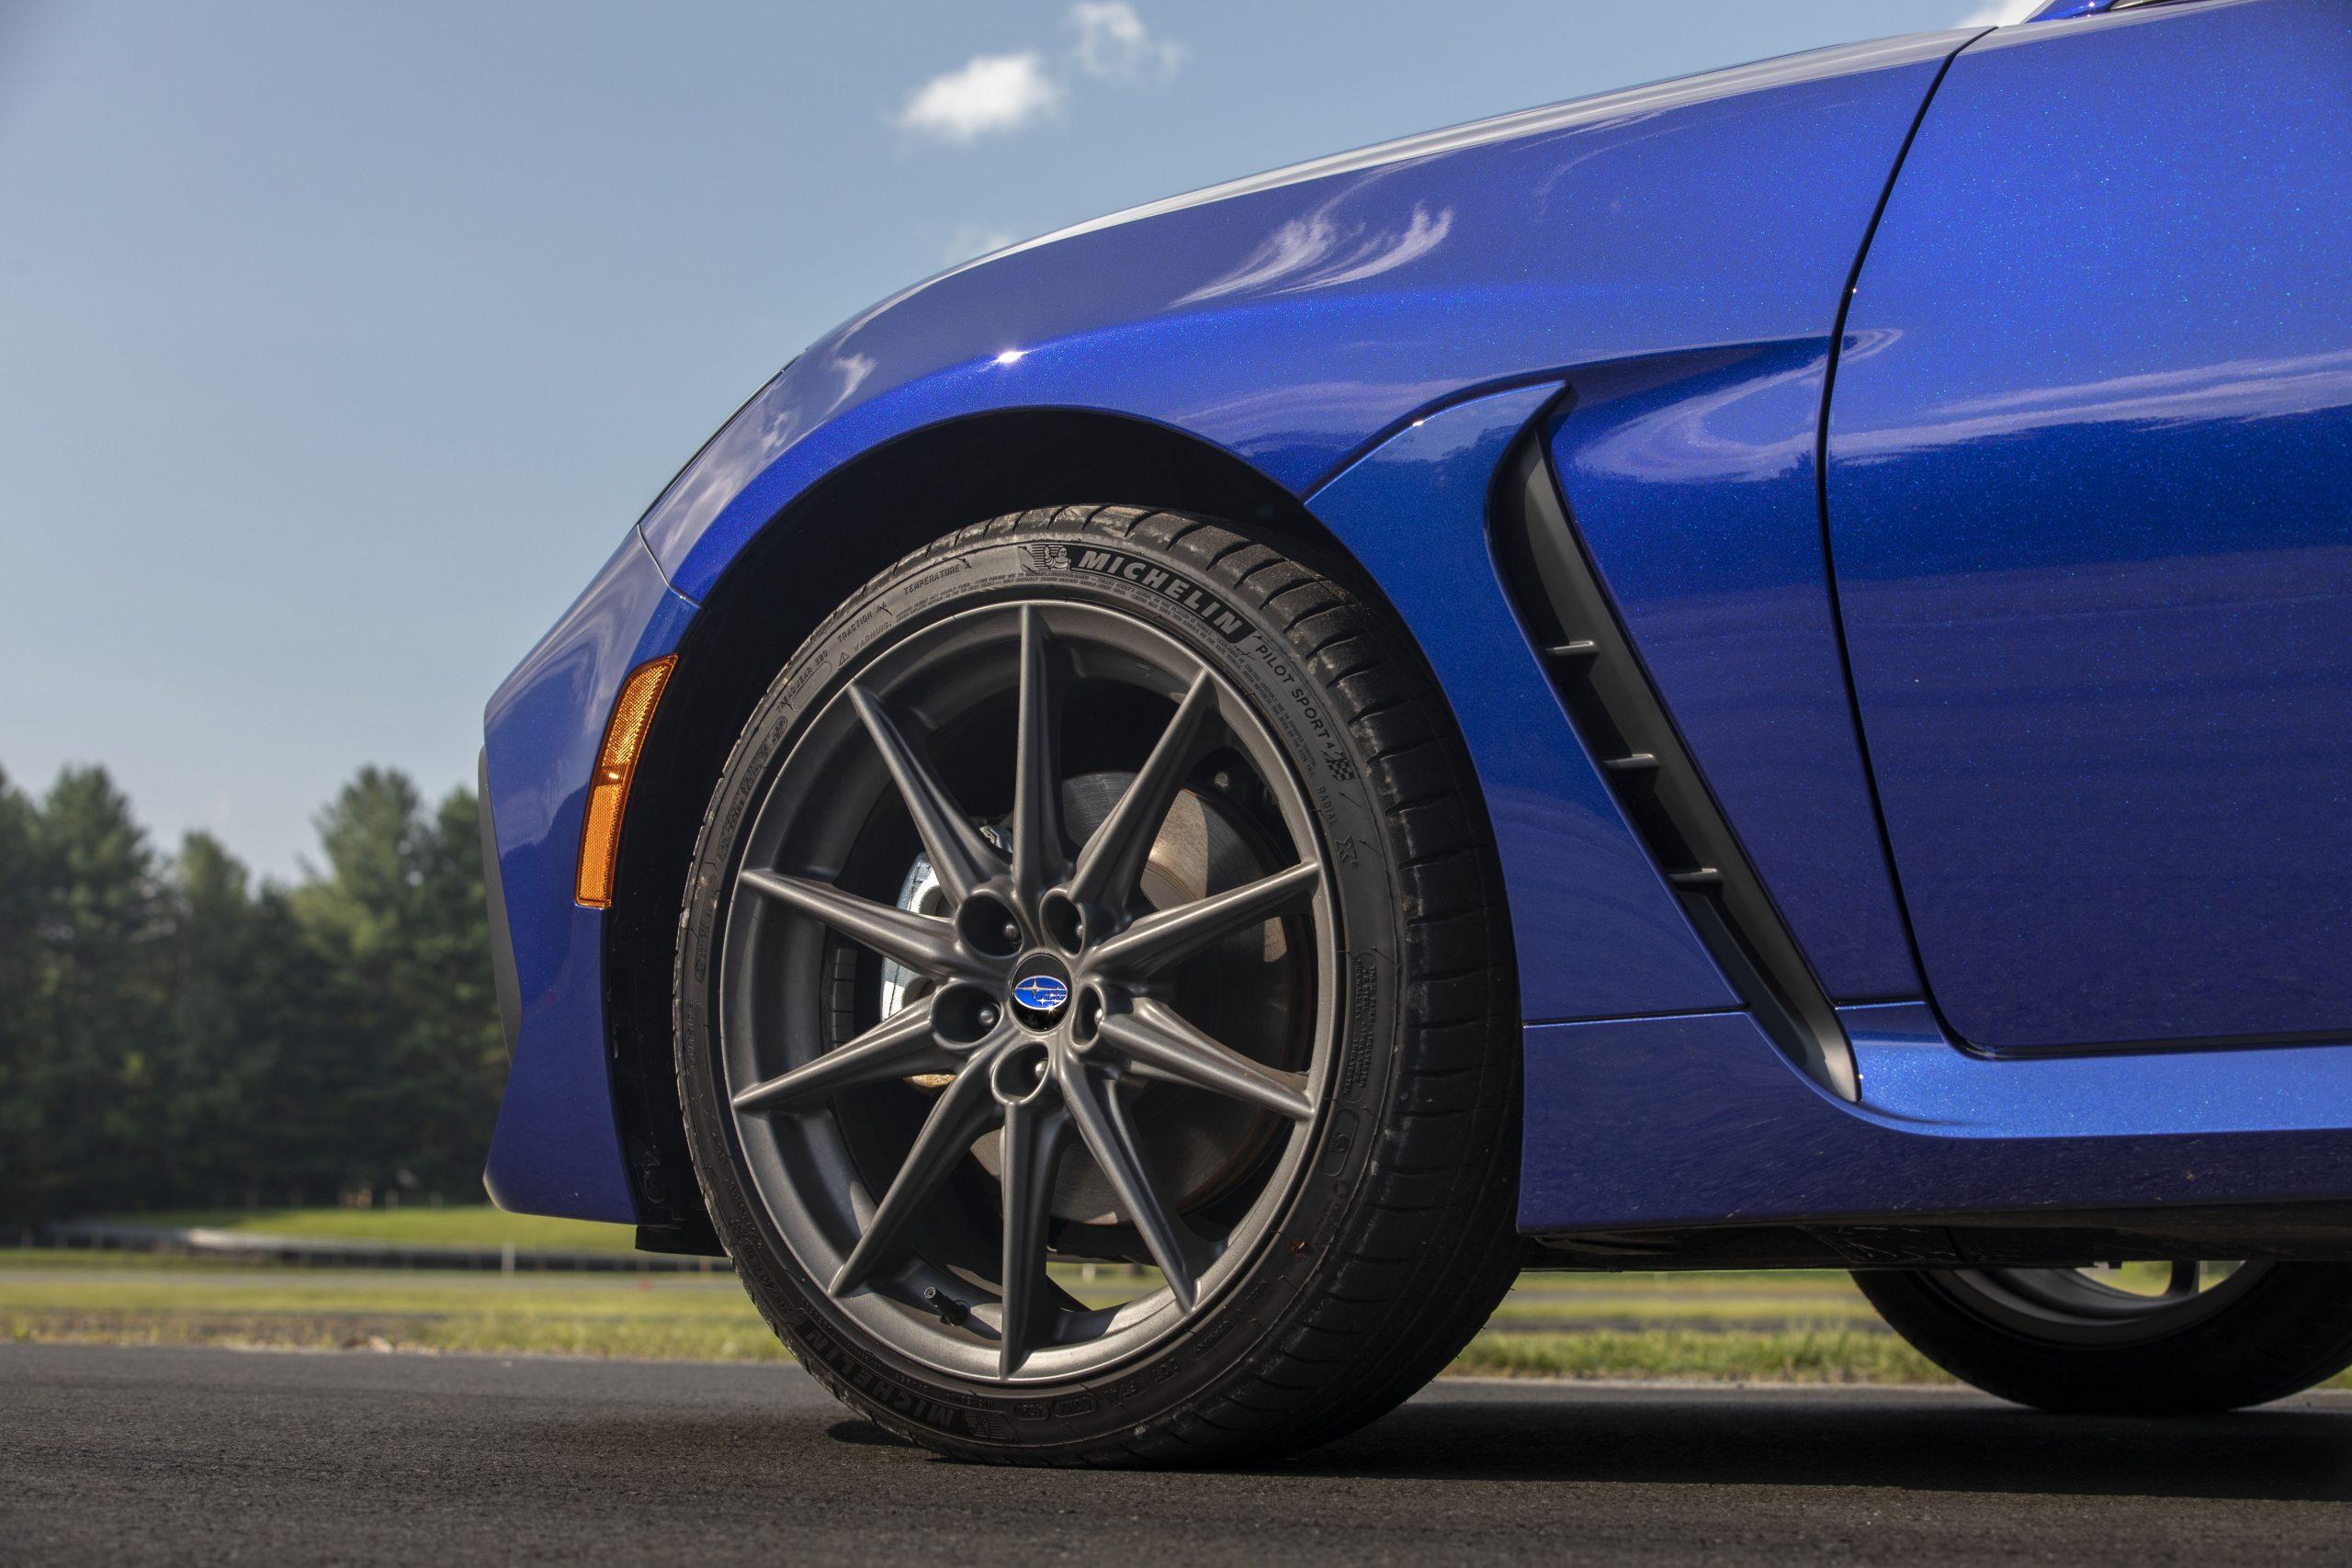 2022 Subaru BRZ front quarter wheel tire brake